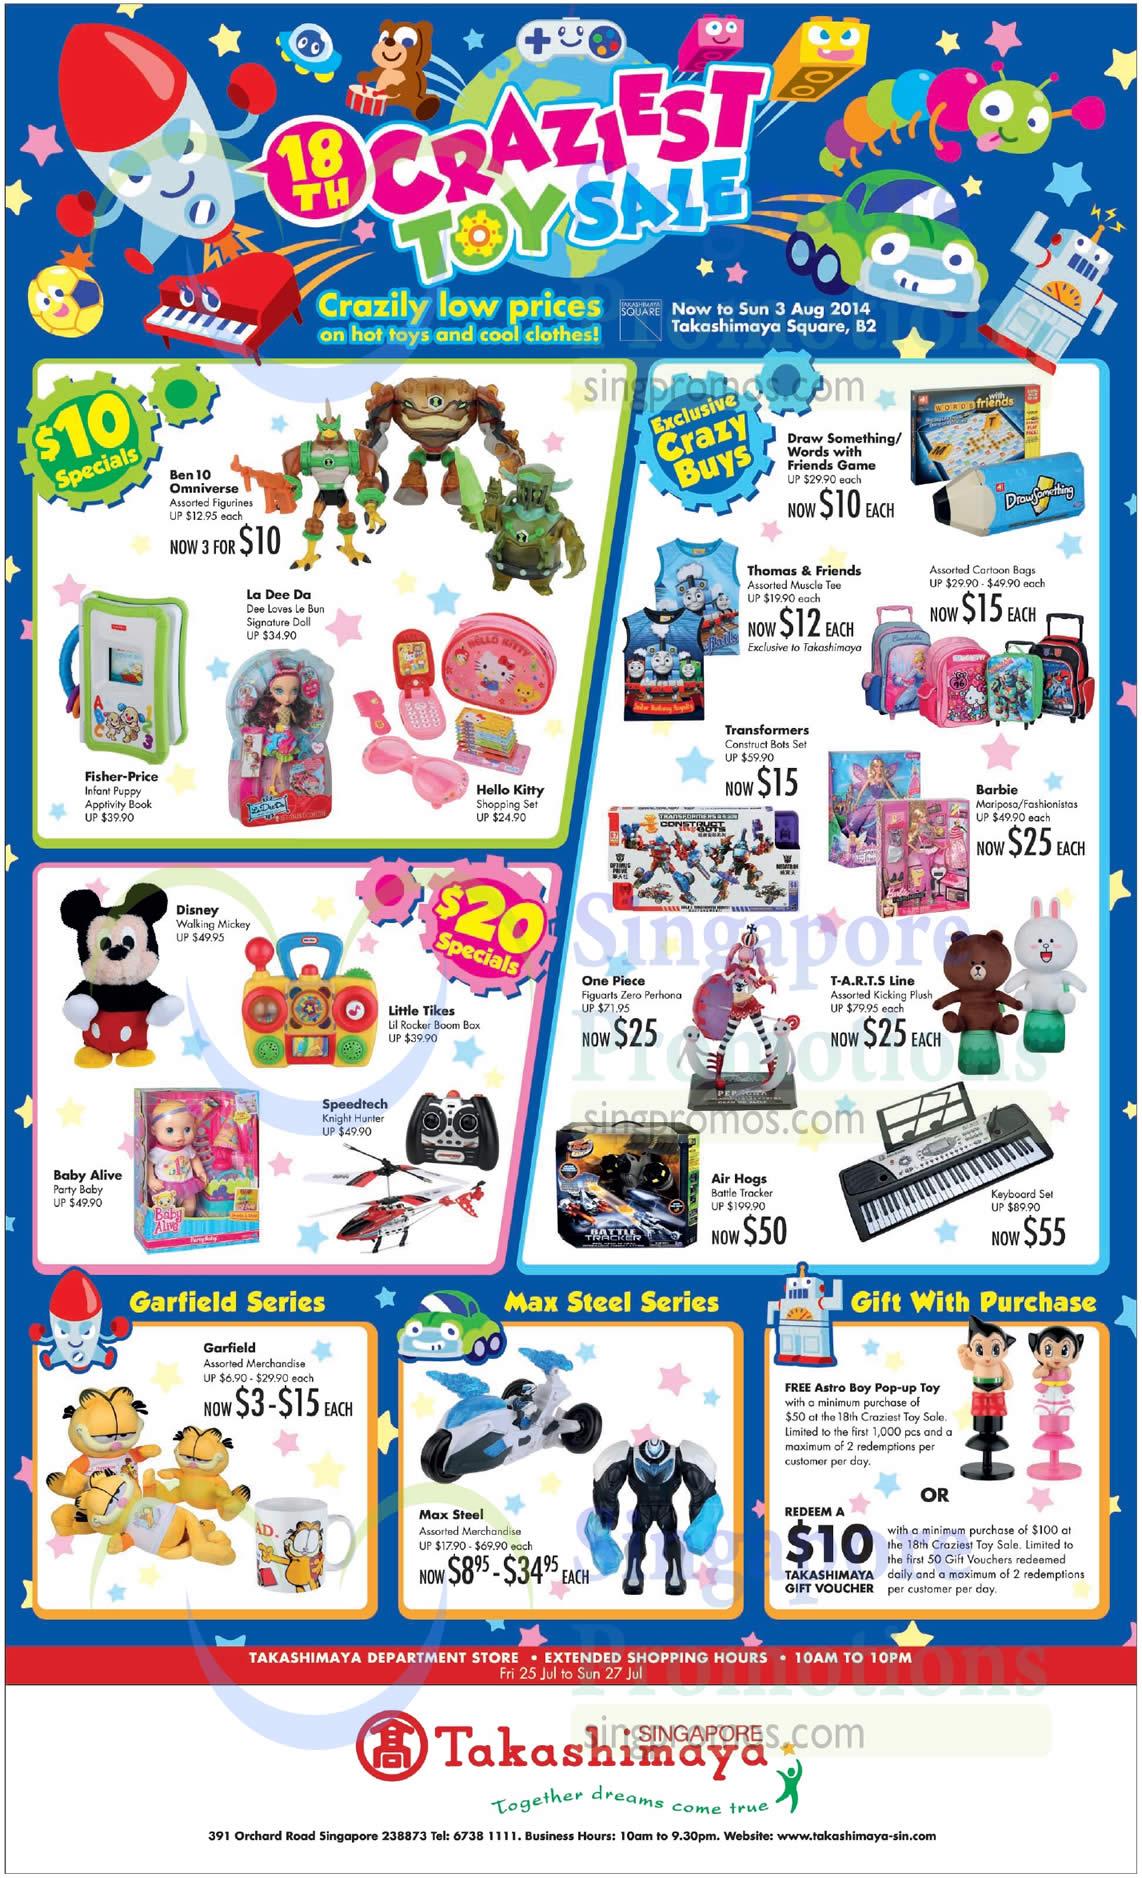 Craziest toy sale 23 jul 3 aug 2014 187 full image 23 jul 10 20